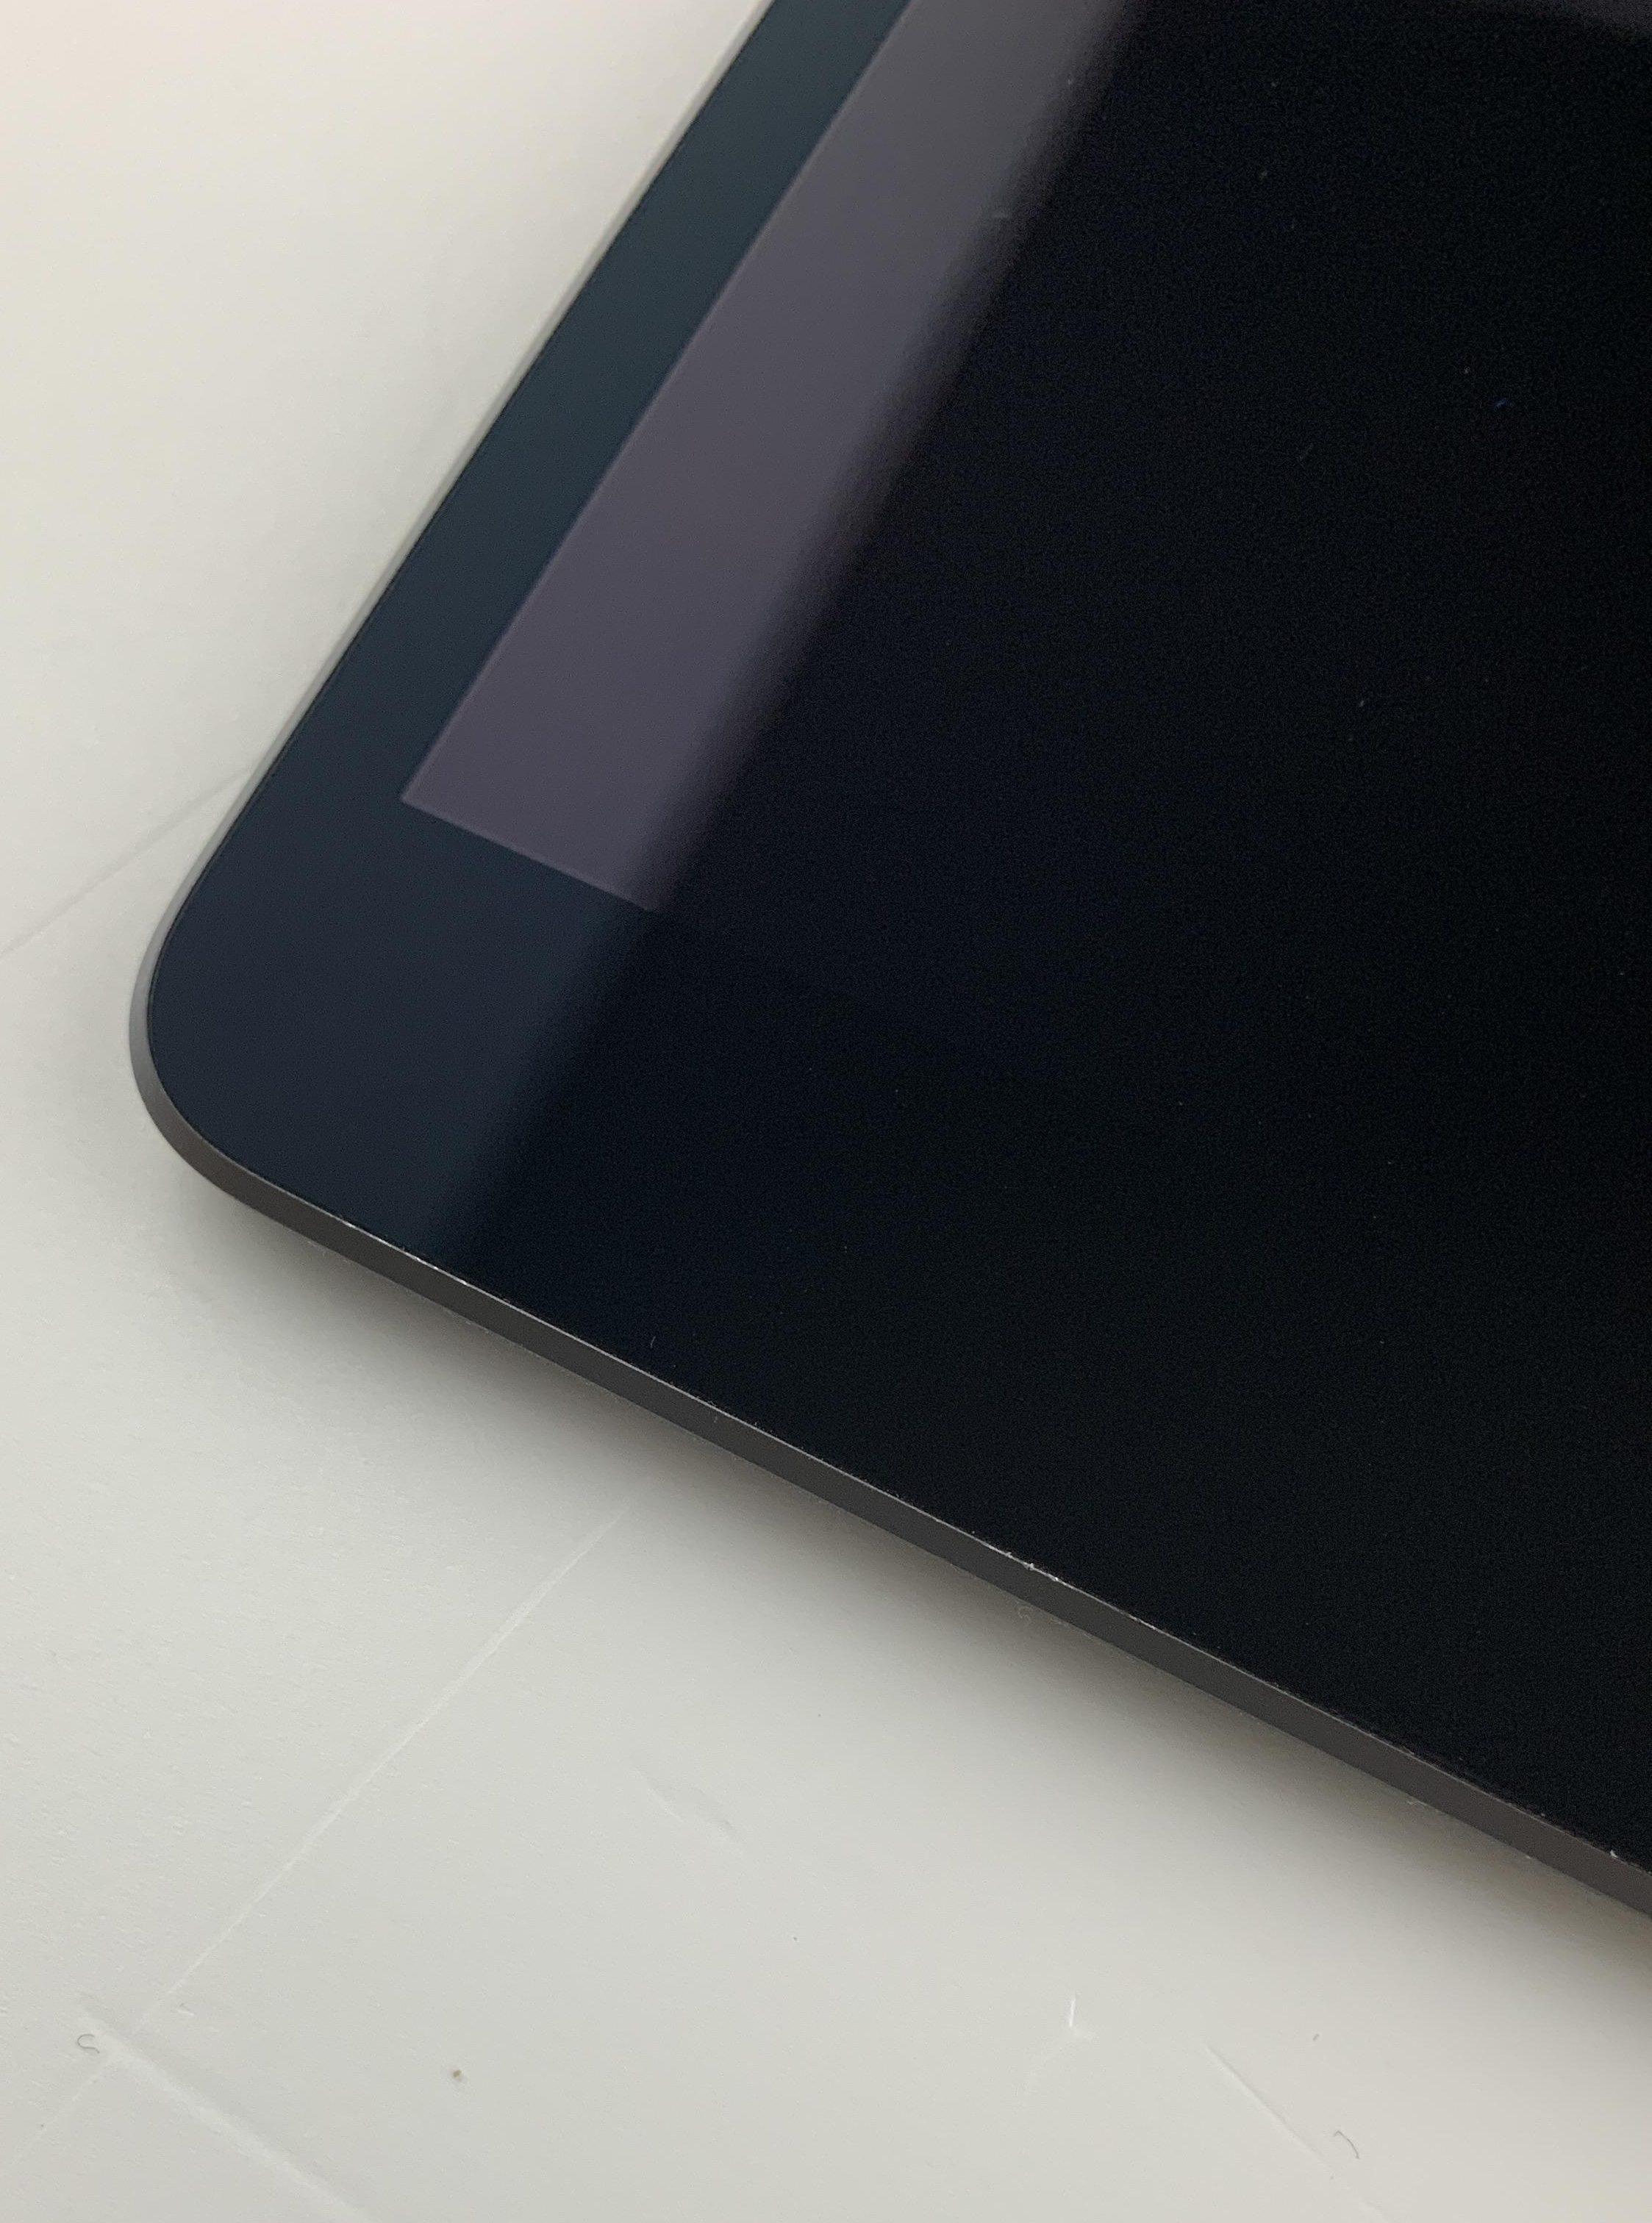 iPad Air 3 Wi-Fi + Cellular 64GB, 64GB, Space Gray, Bild 5